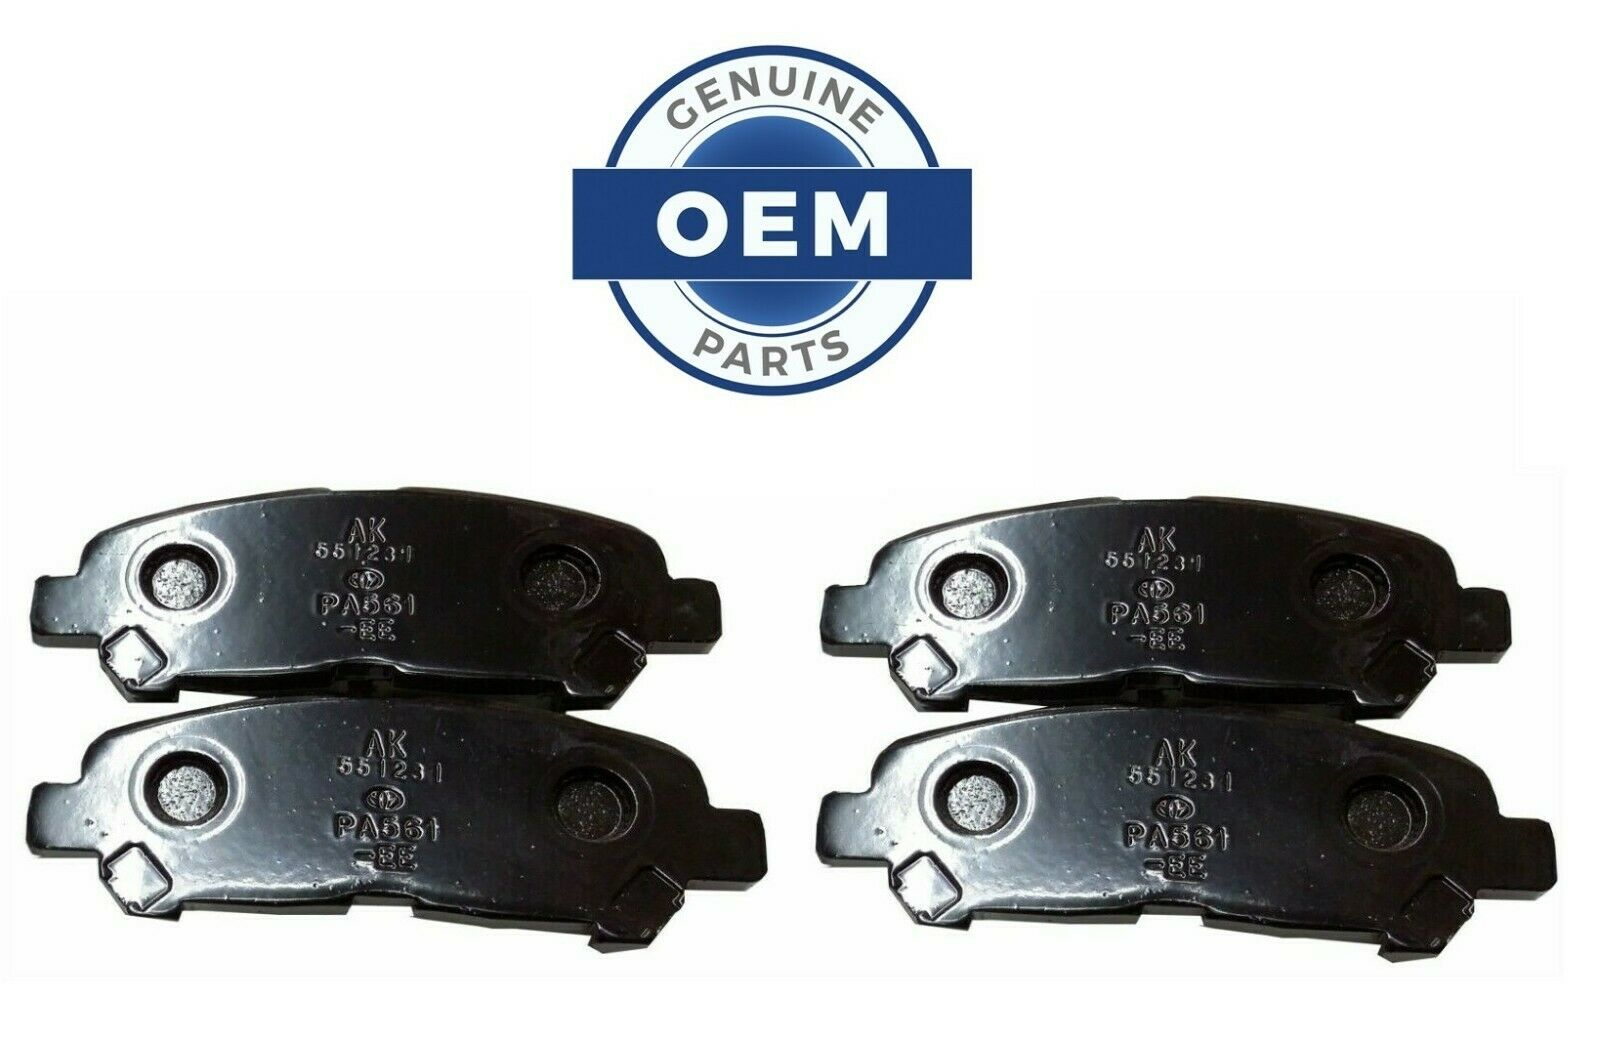 2010-2013 HIGHLANDER  REAR Brake Pads NEW genuine Toyota OEM 04466-0E020